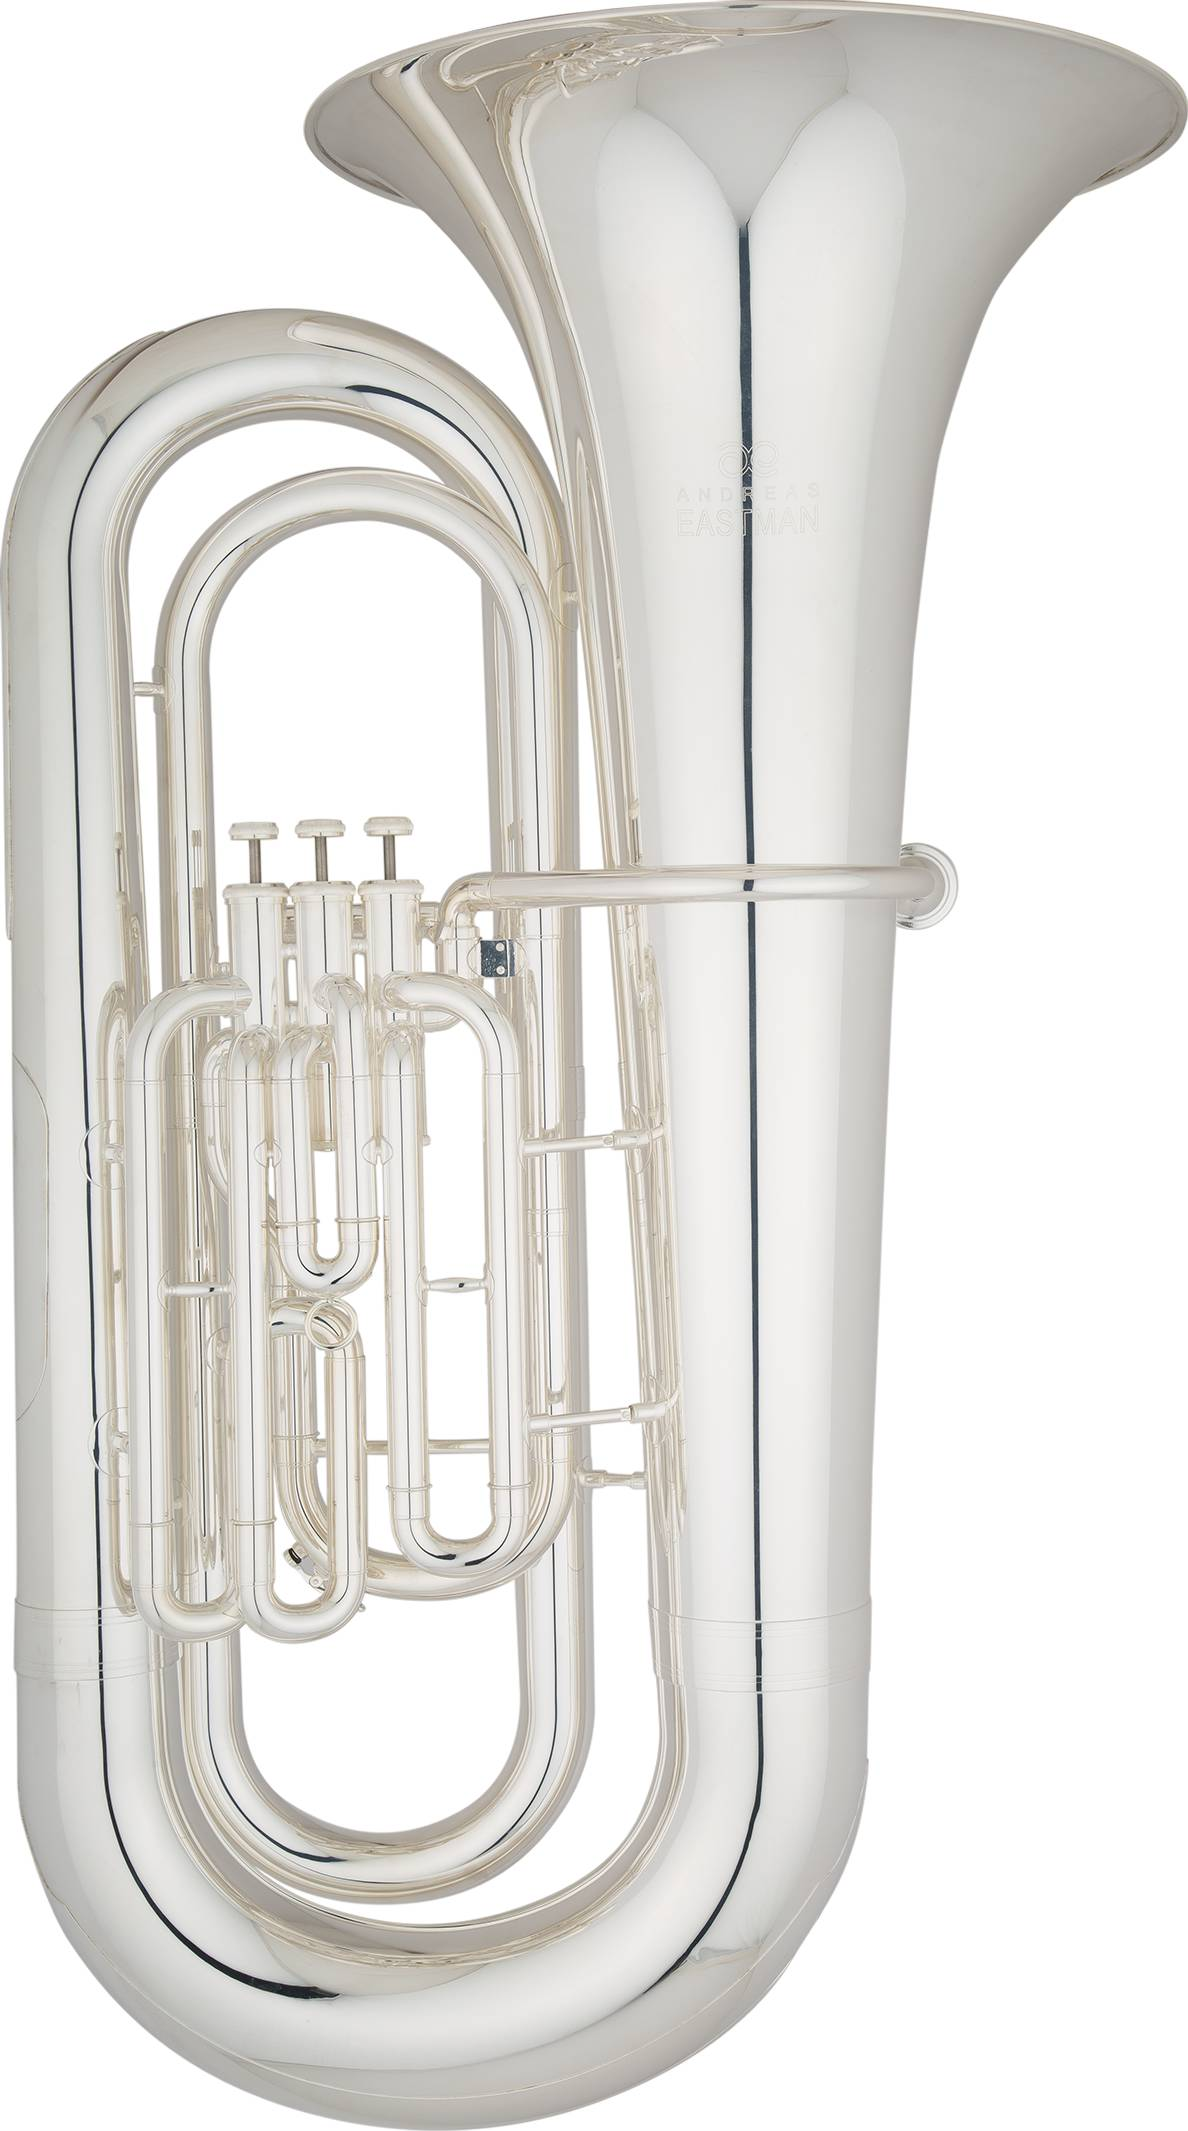 ebb331m-SS